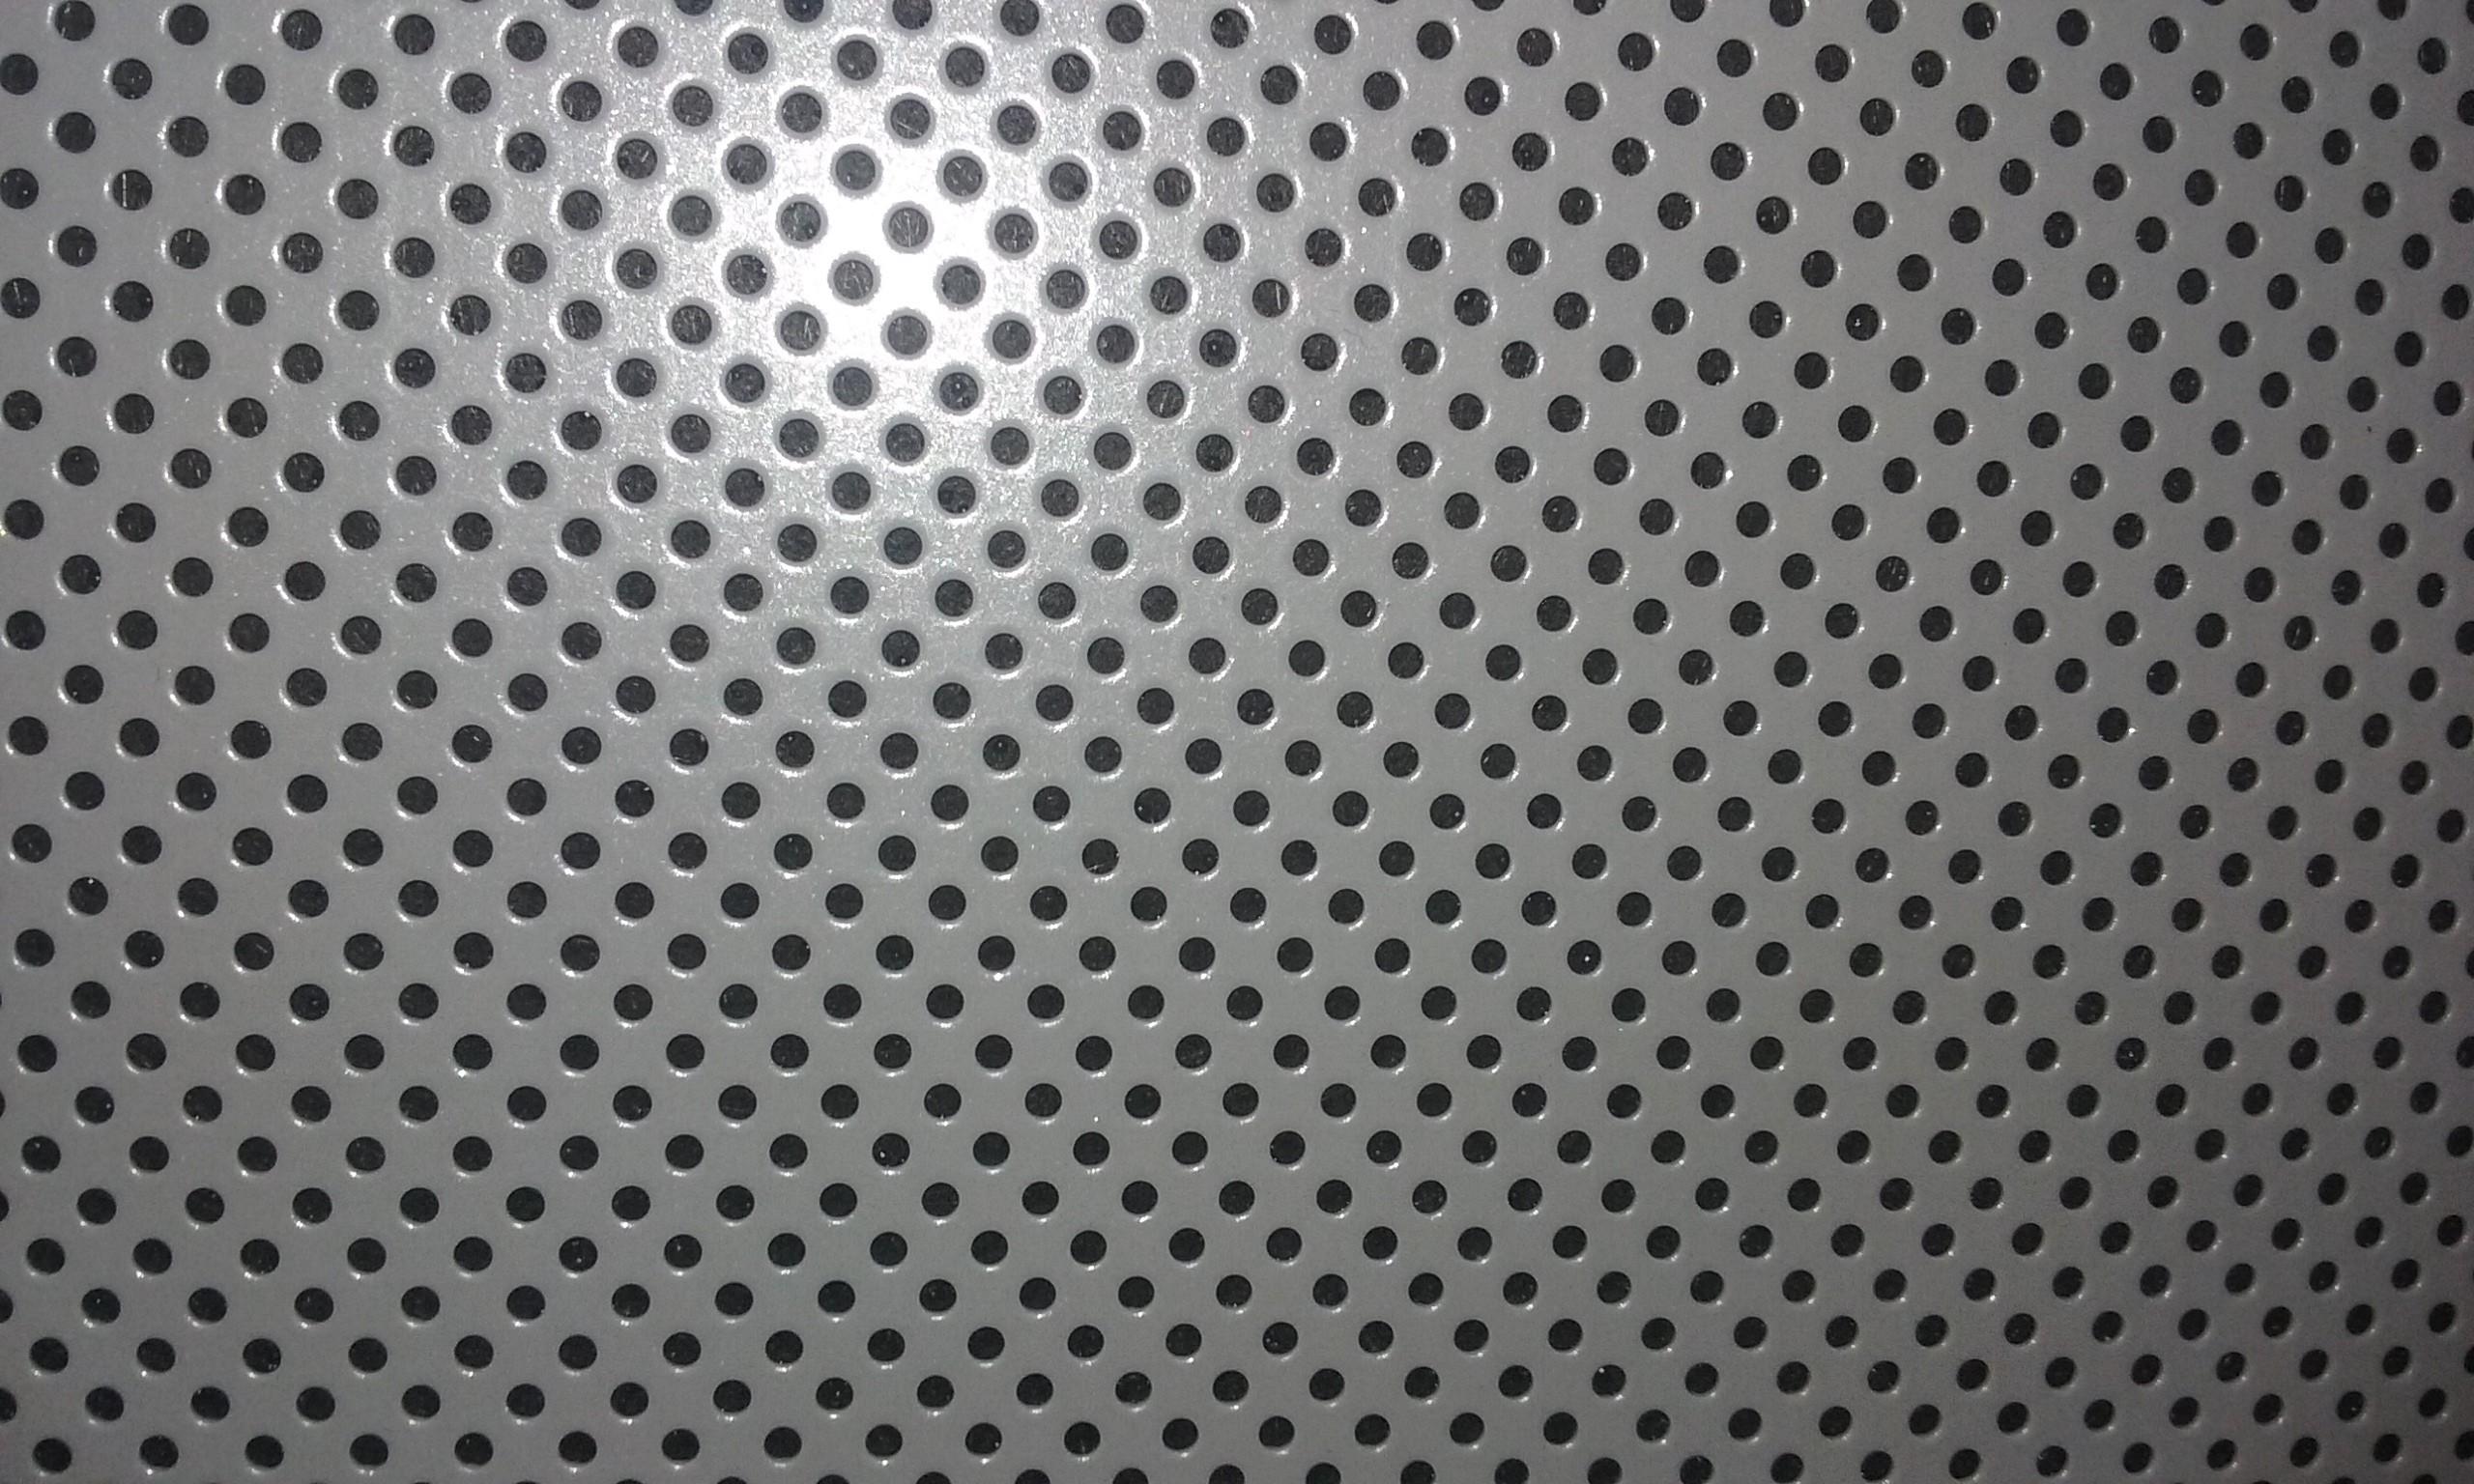 Armstrong Tegular Metal Ceiling Tiles 2 X 2 Pack Of 16 Diggerslist